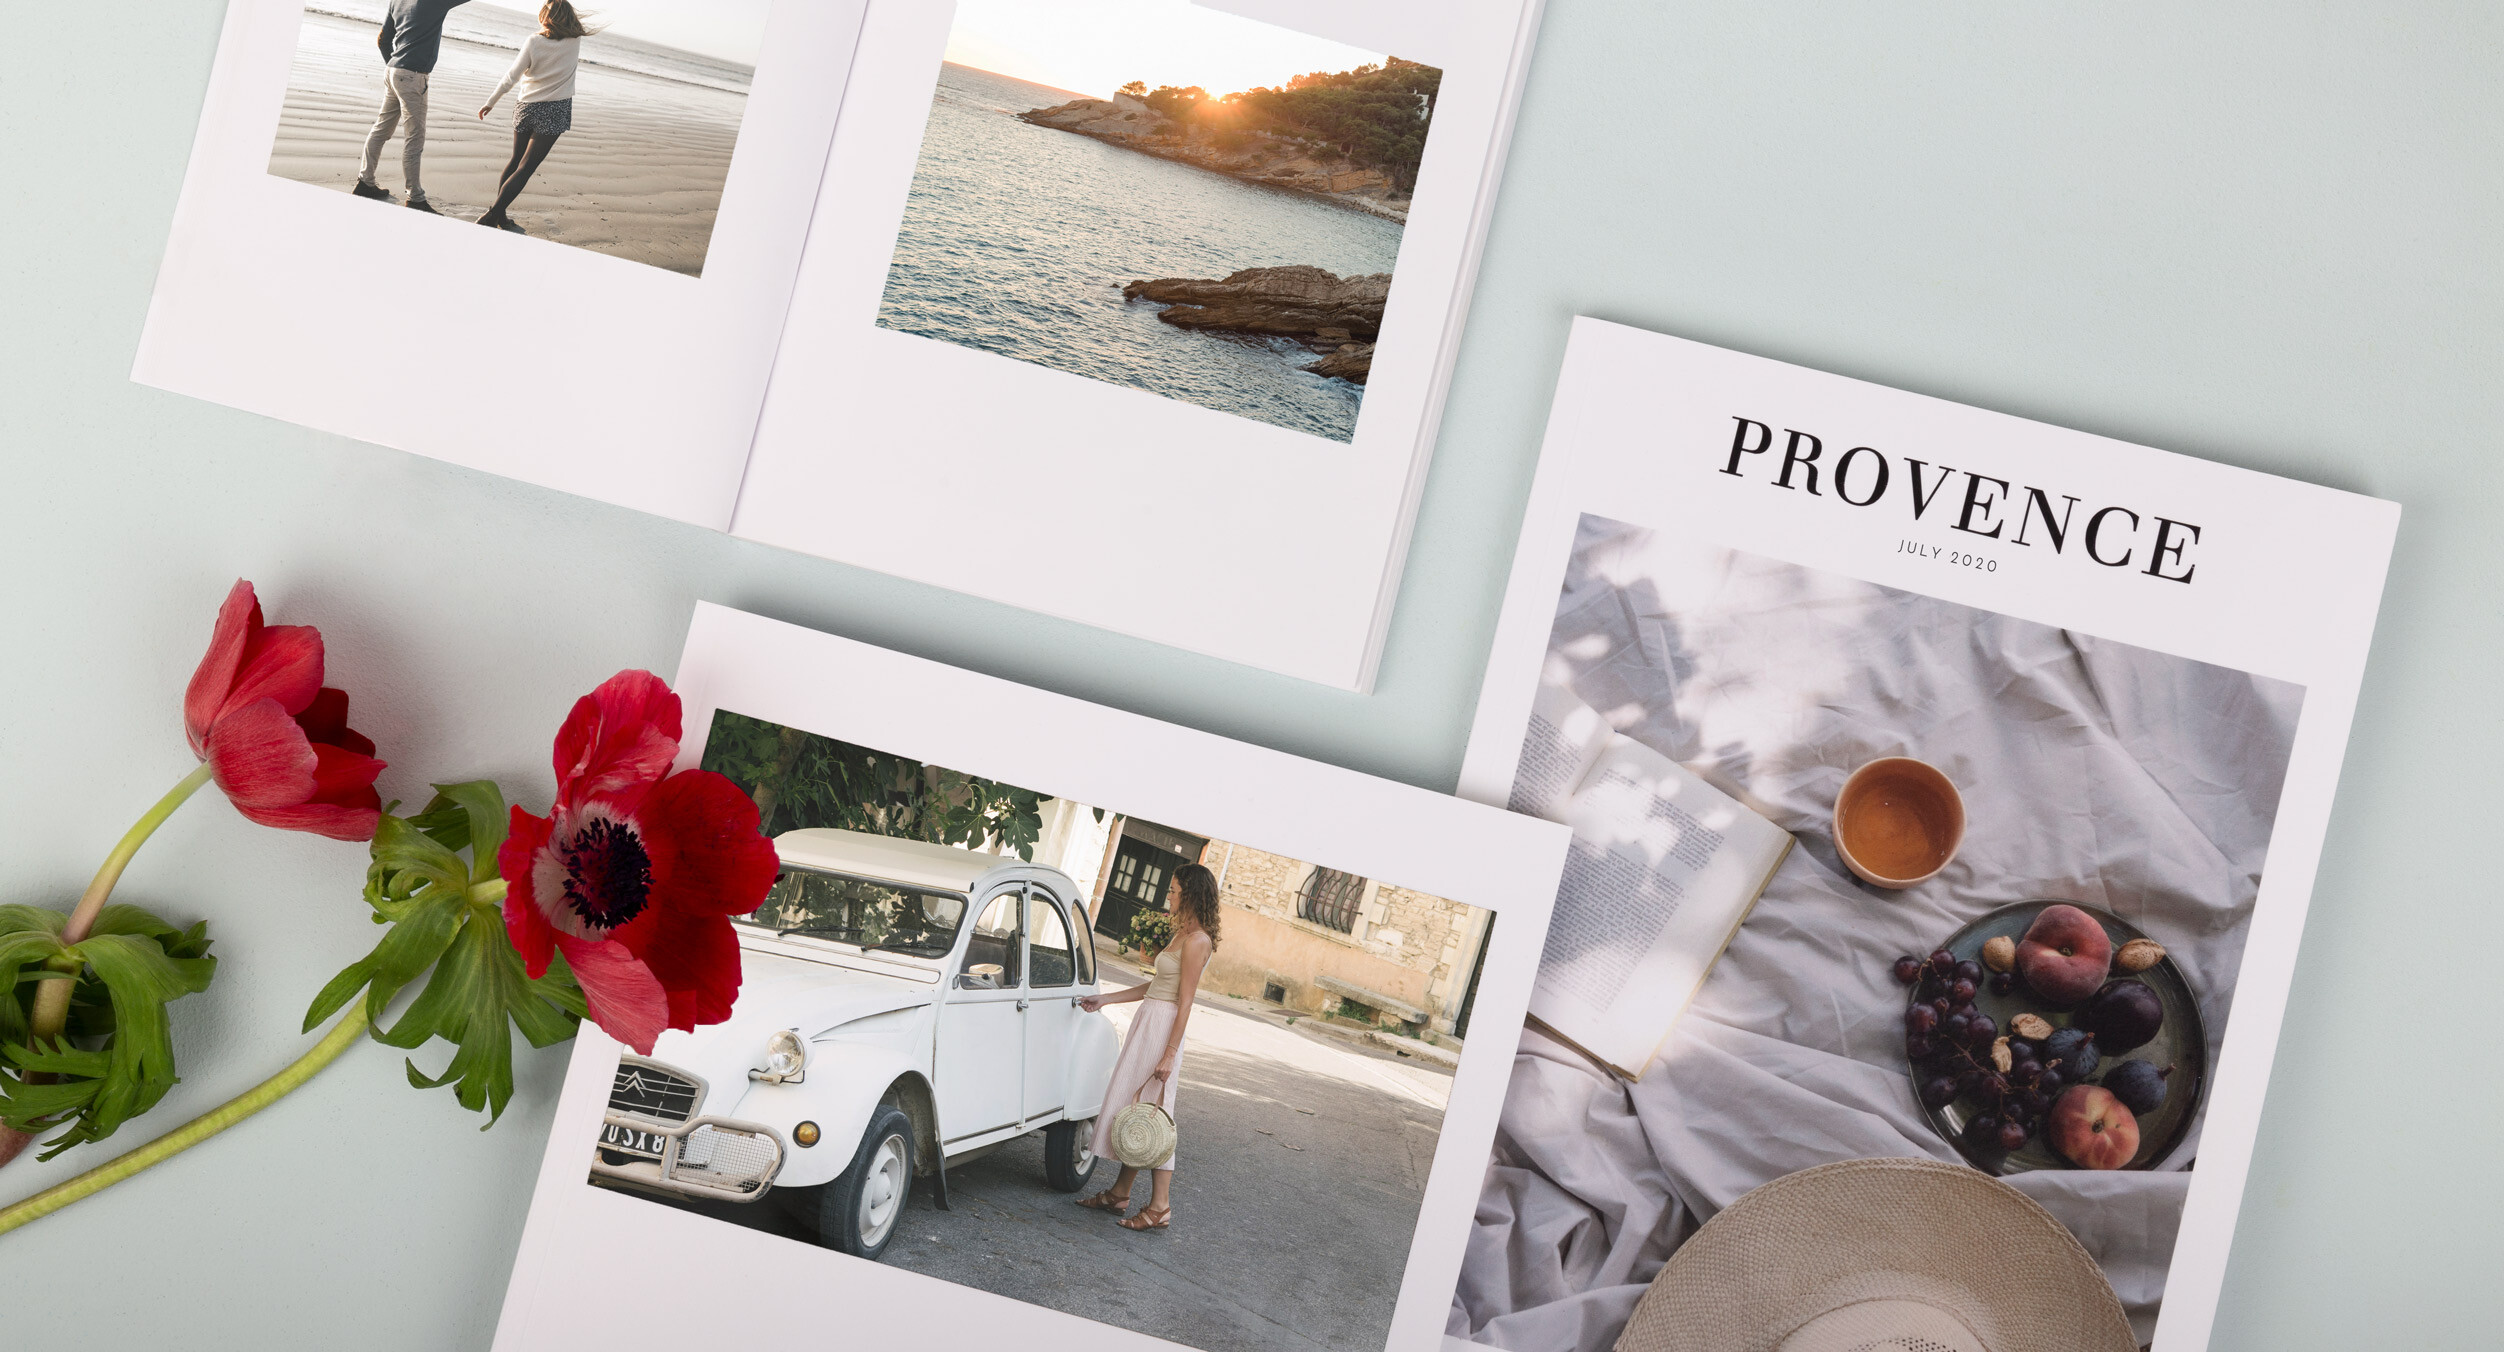 Honeymoon Photo Albums from Rosemood